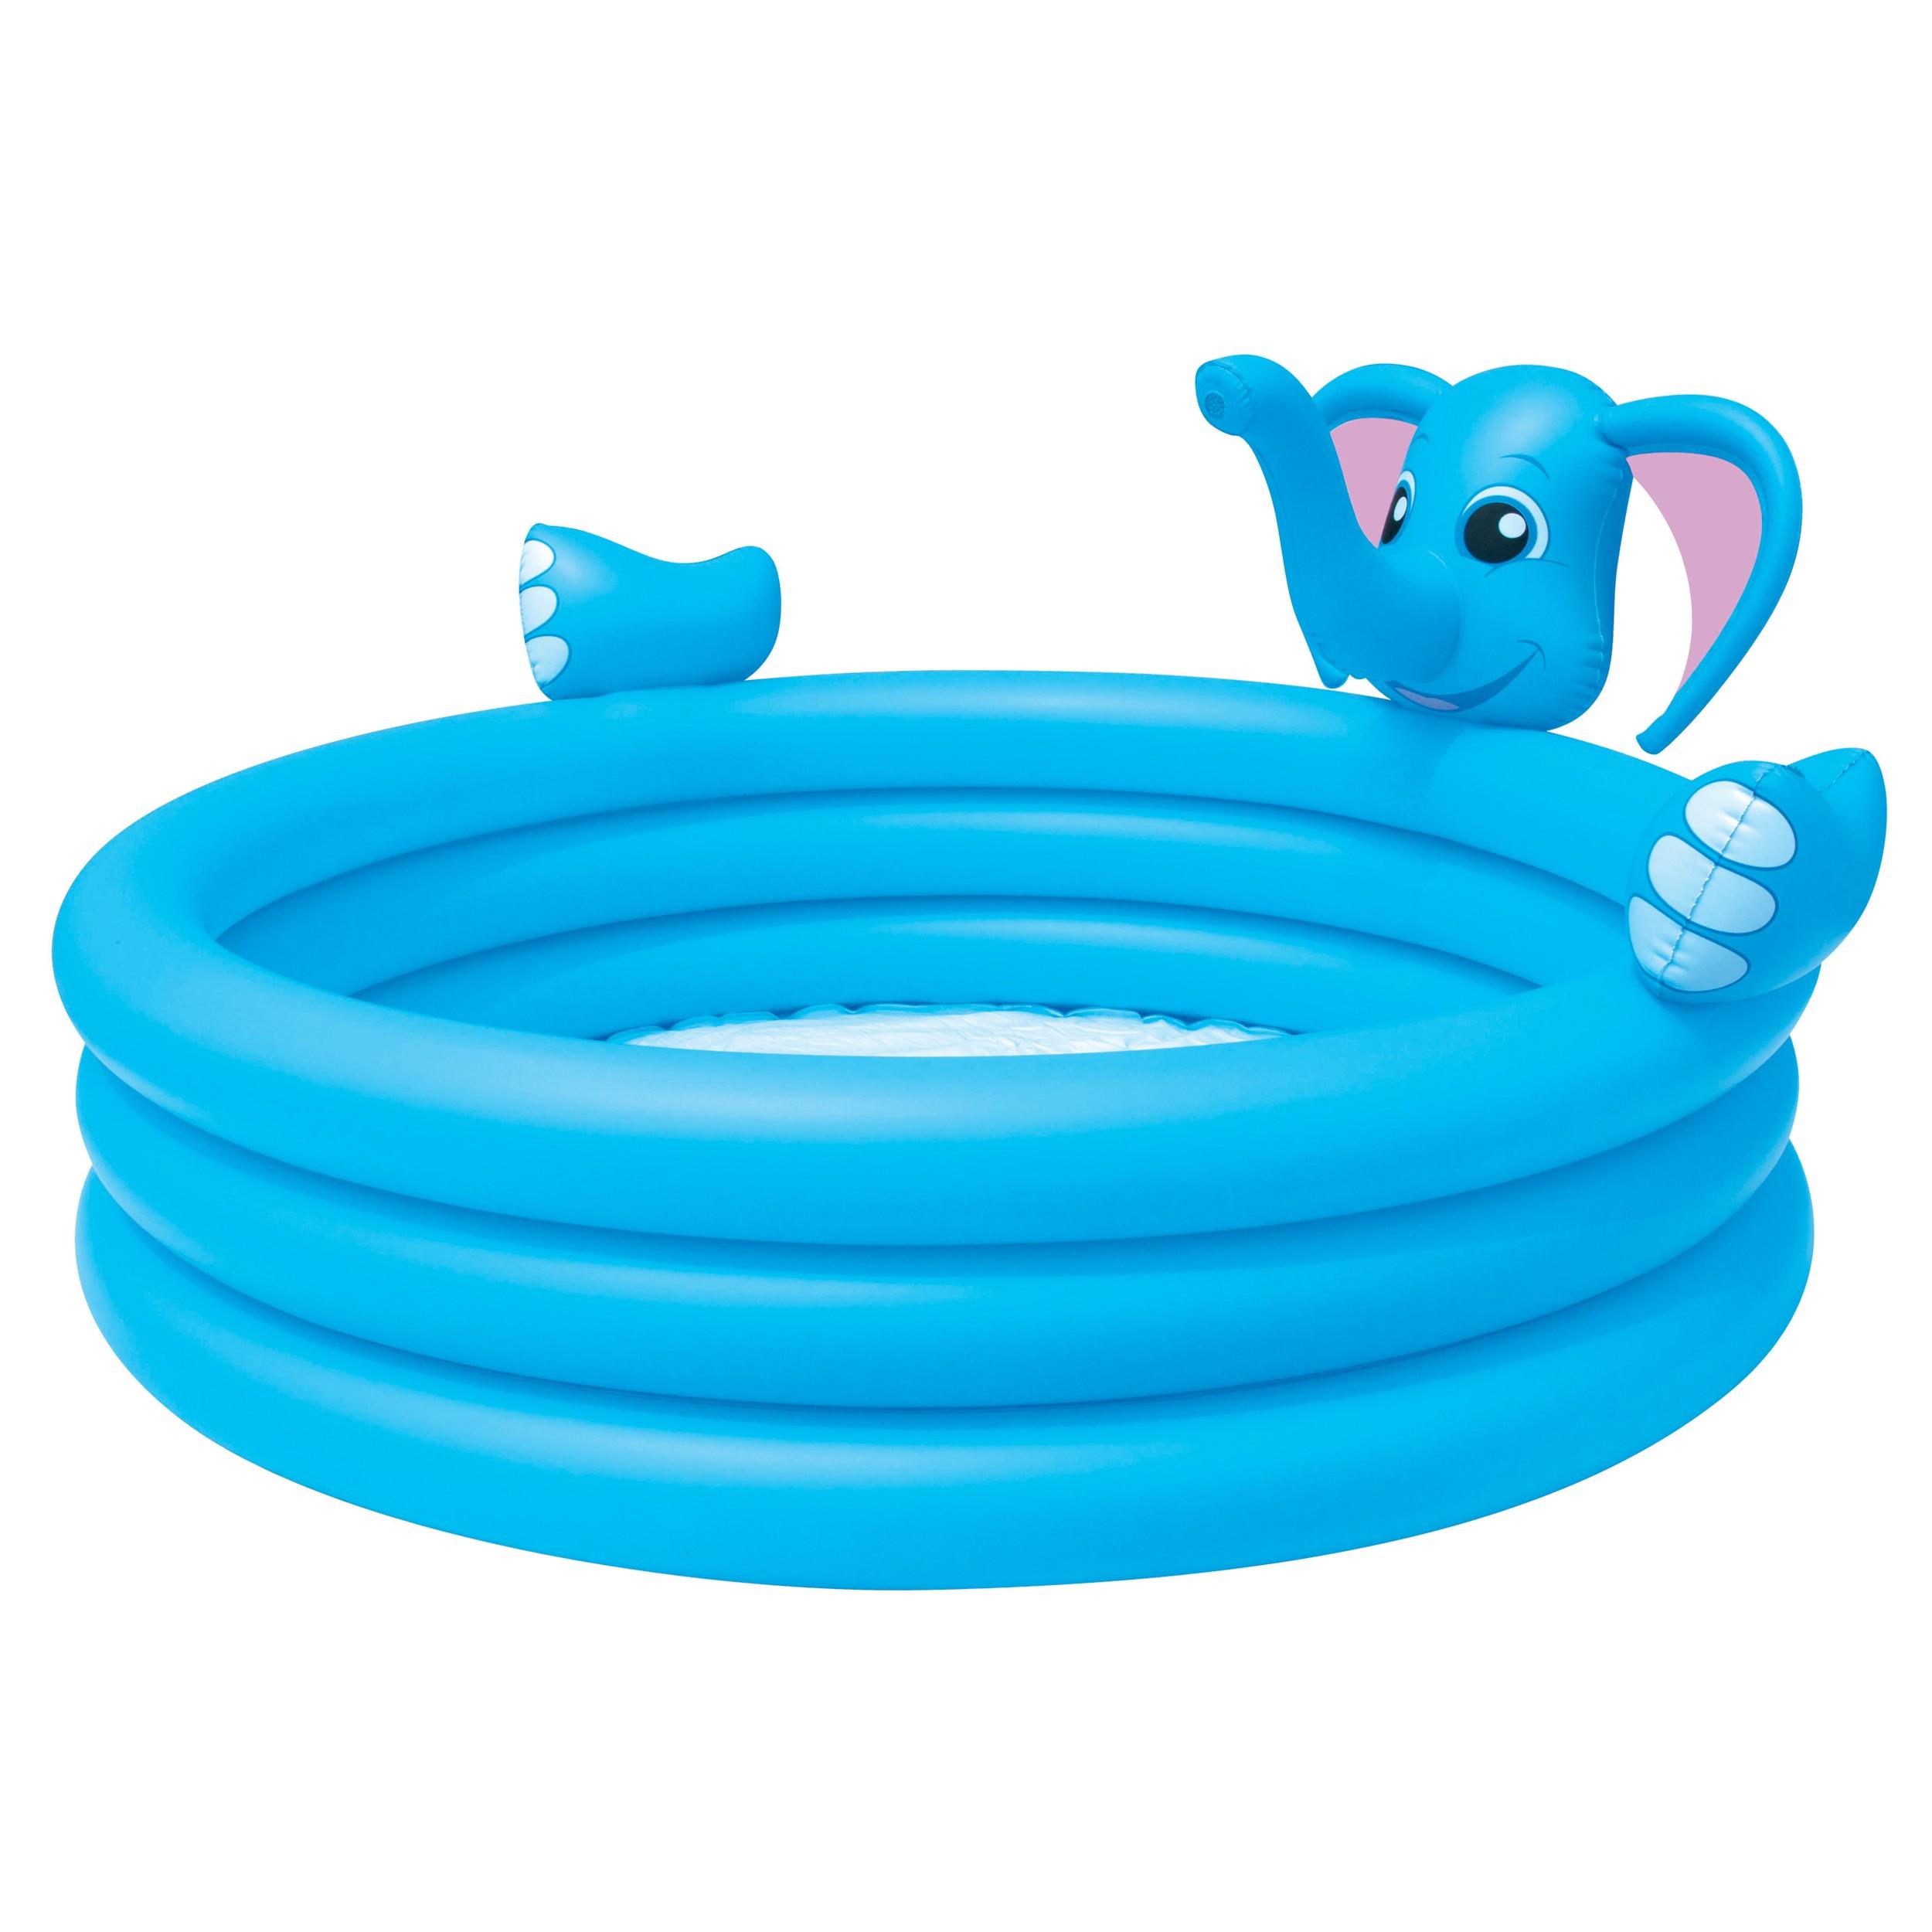 Bestway nafukovací bazének slon 152x74 cm